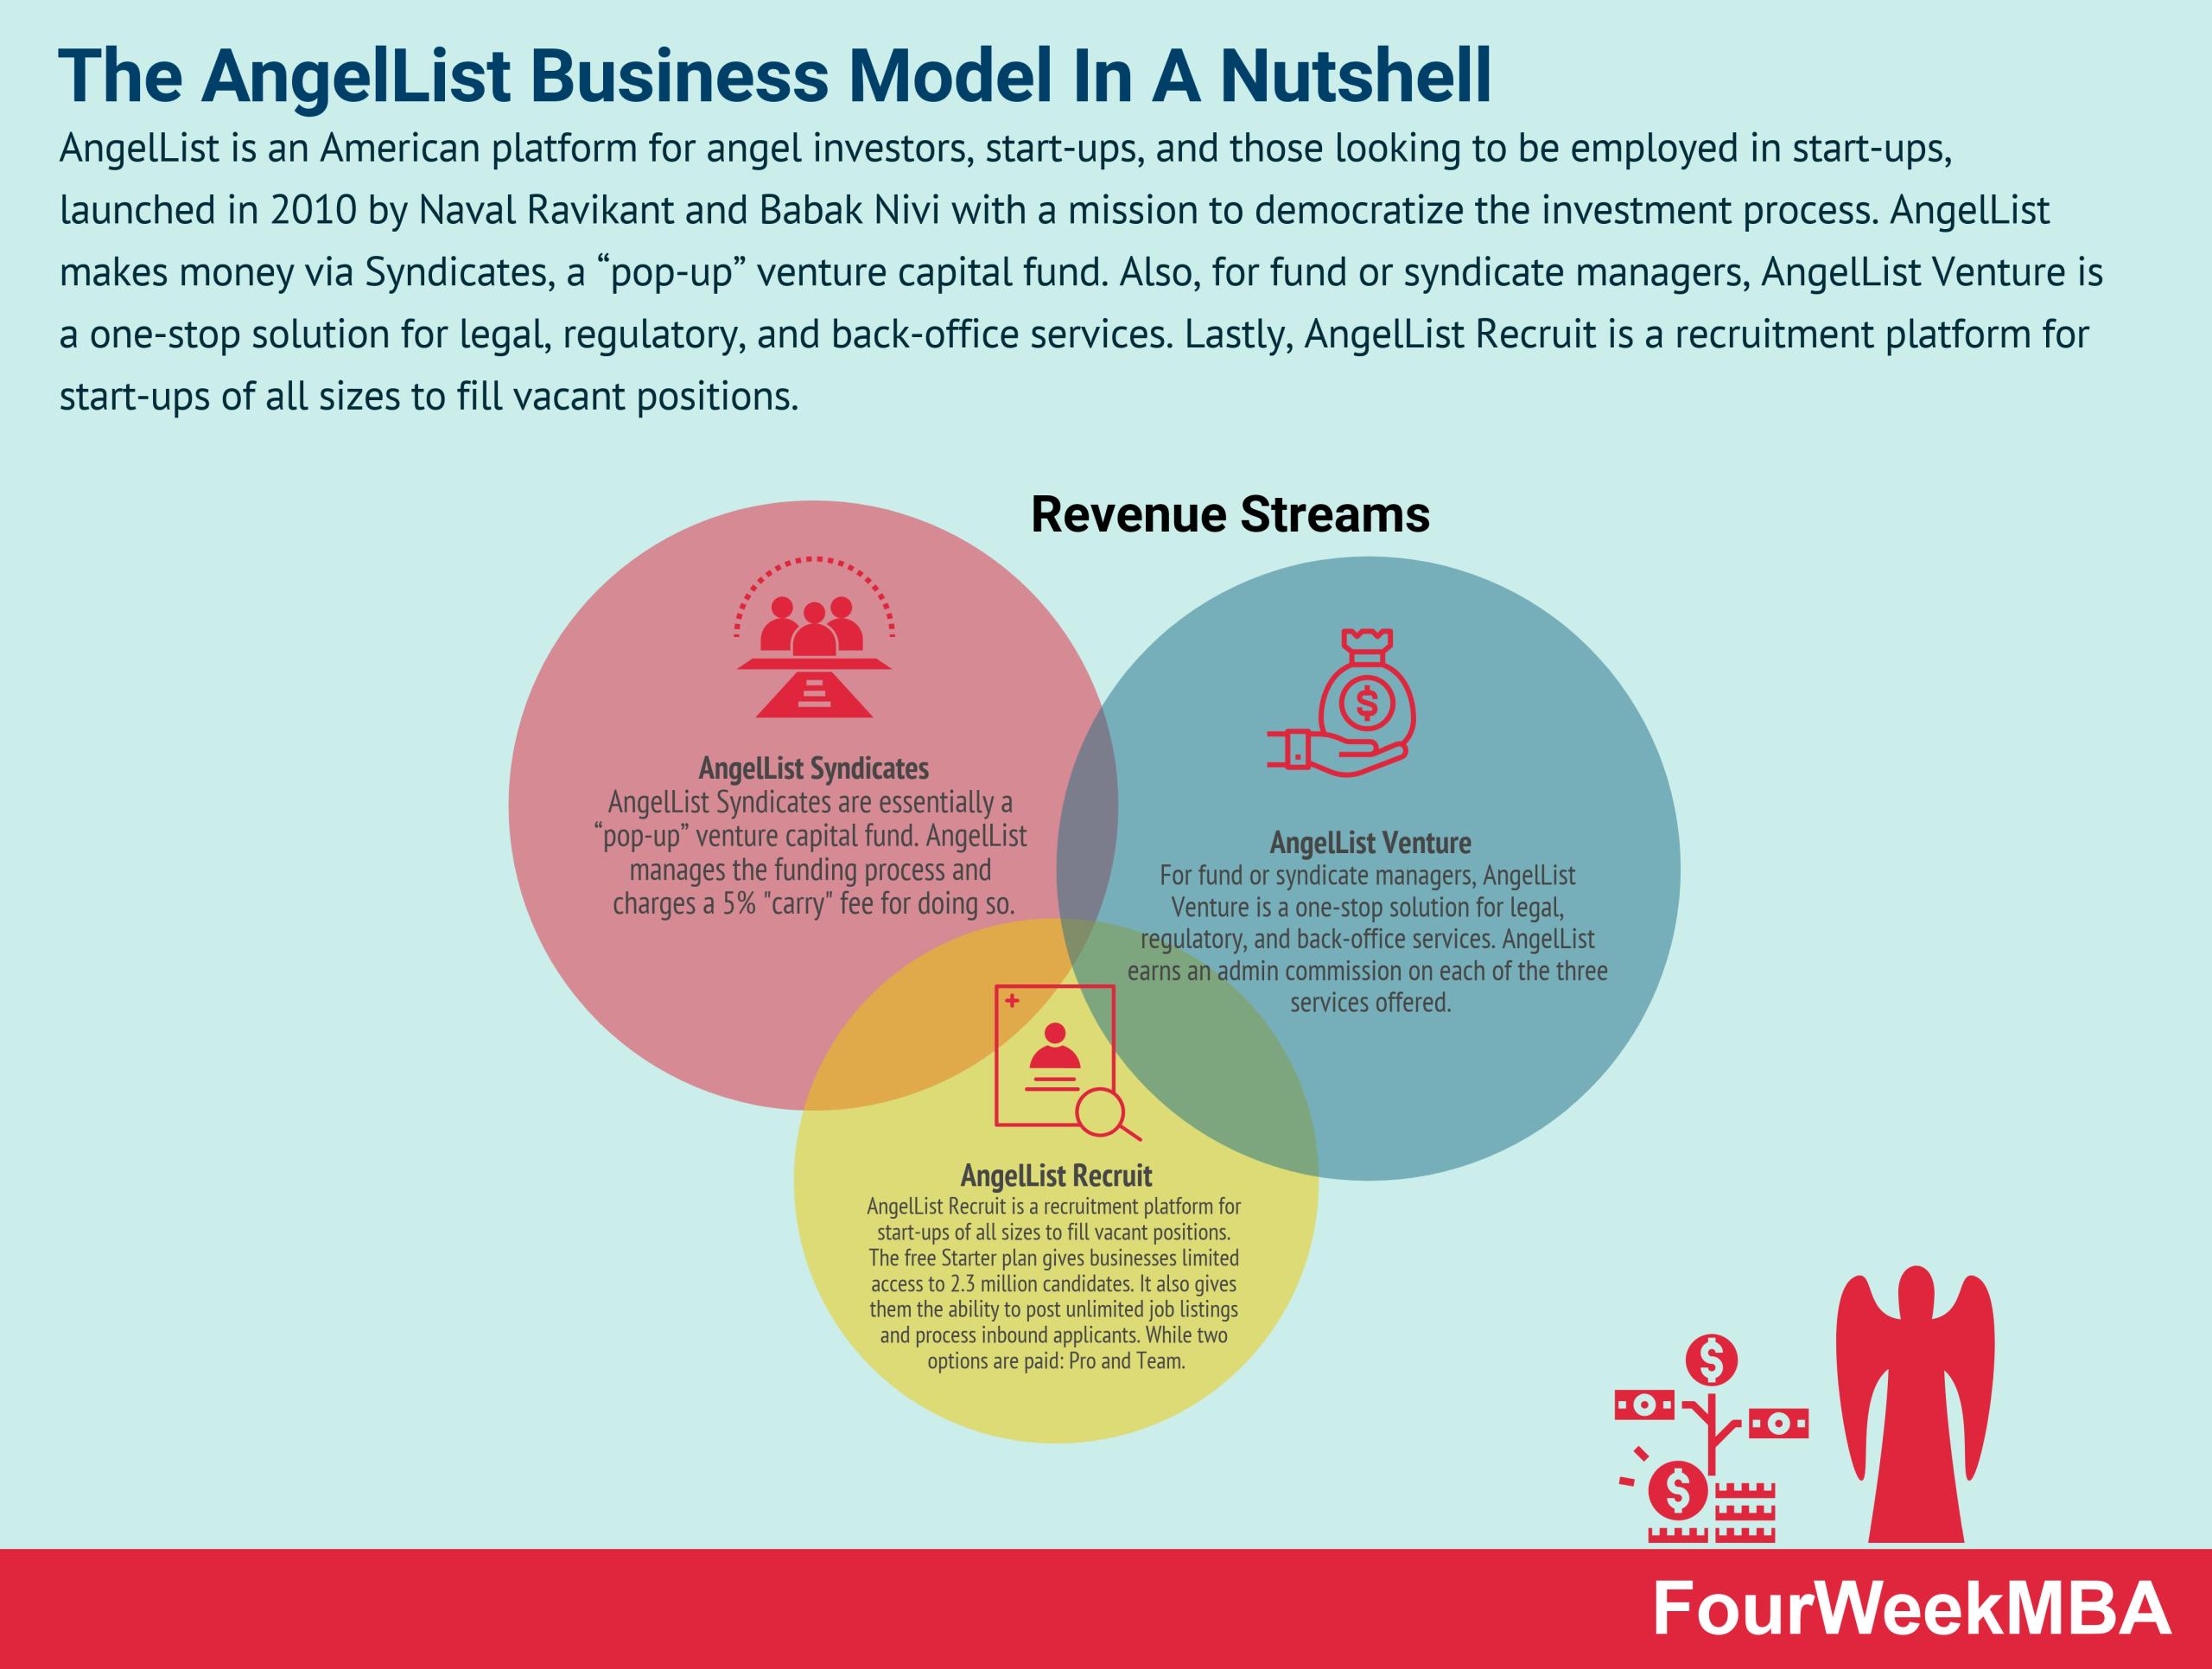 how-does-angellist-make-money-angellist-business-model